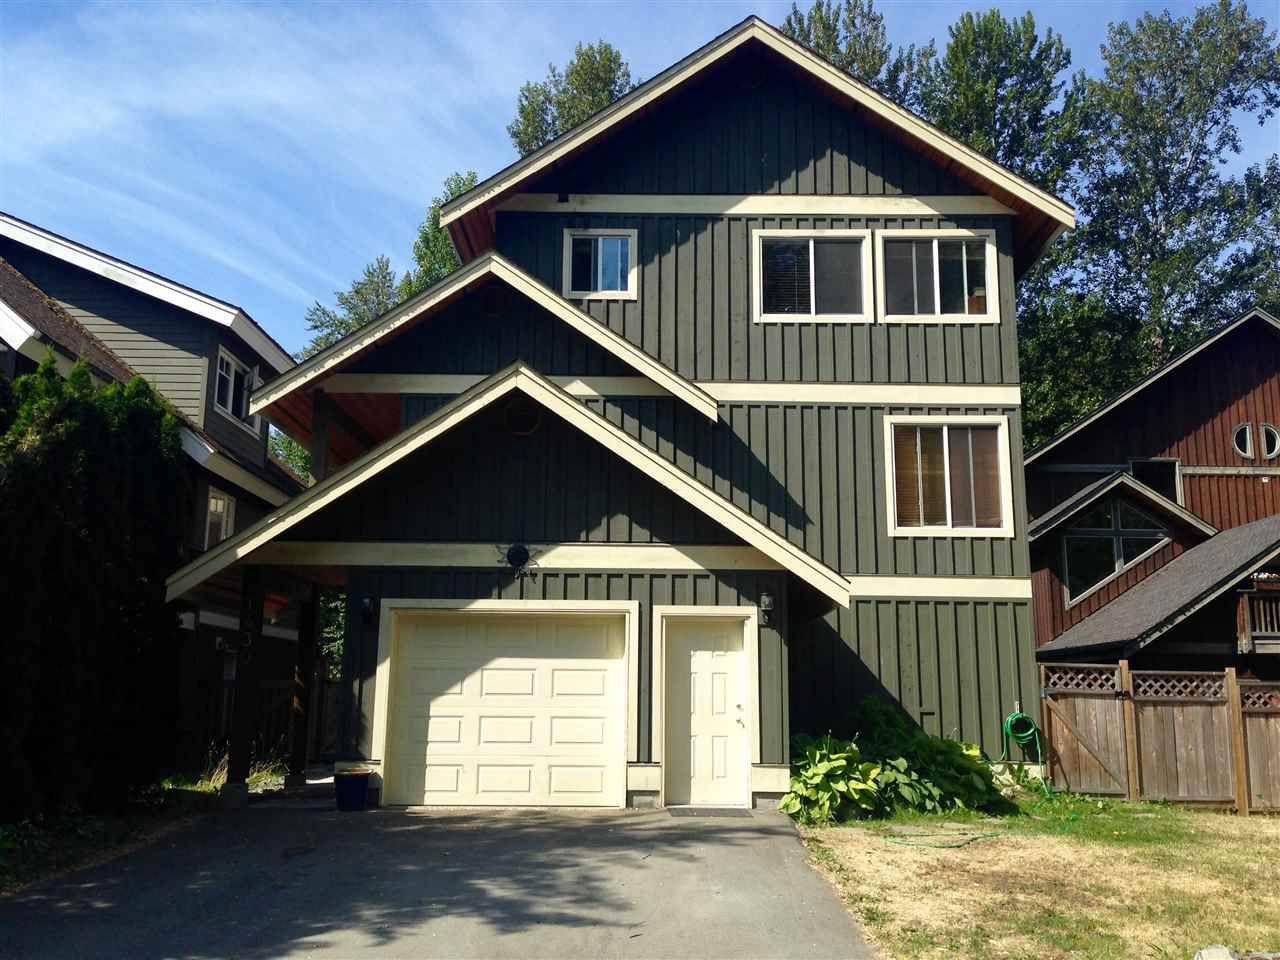 Main Photo: 1430 ALDER Street: Pemberton House for sale : MLS®# R2184972